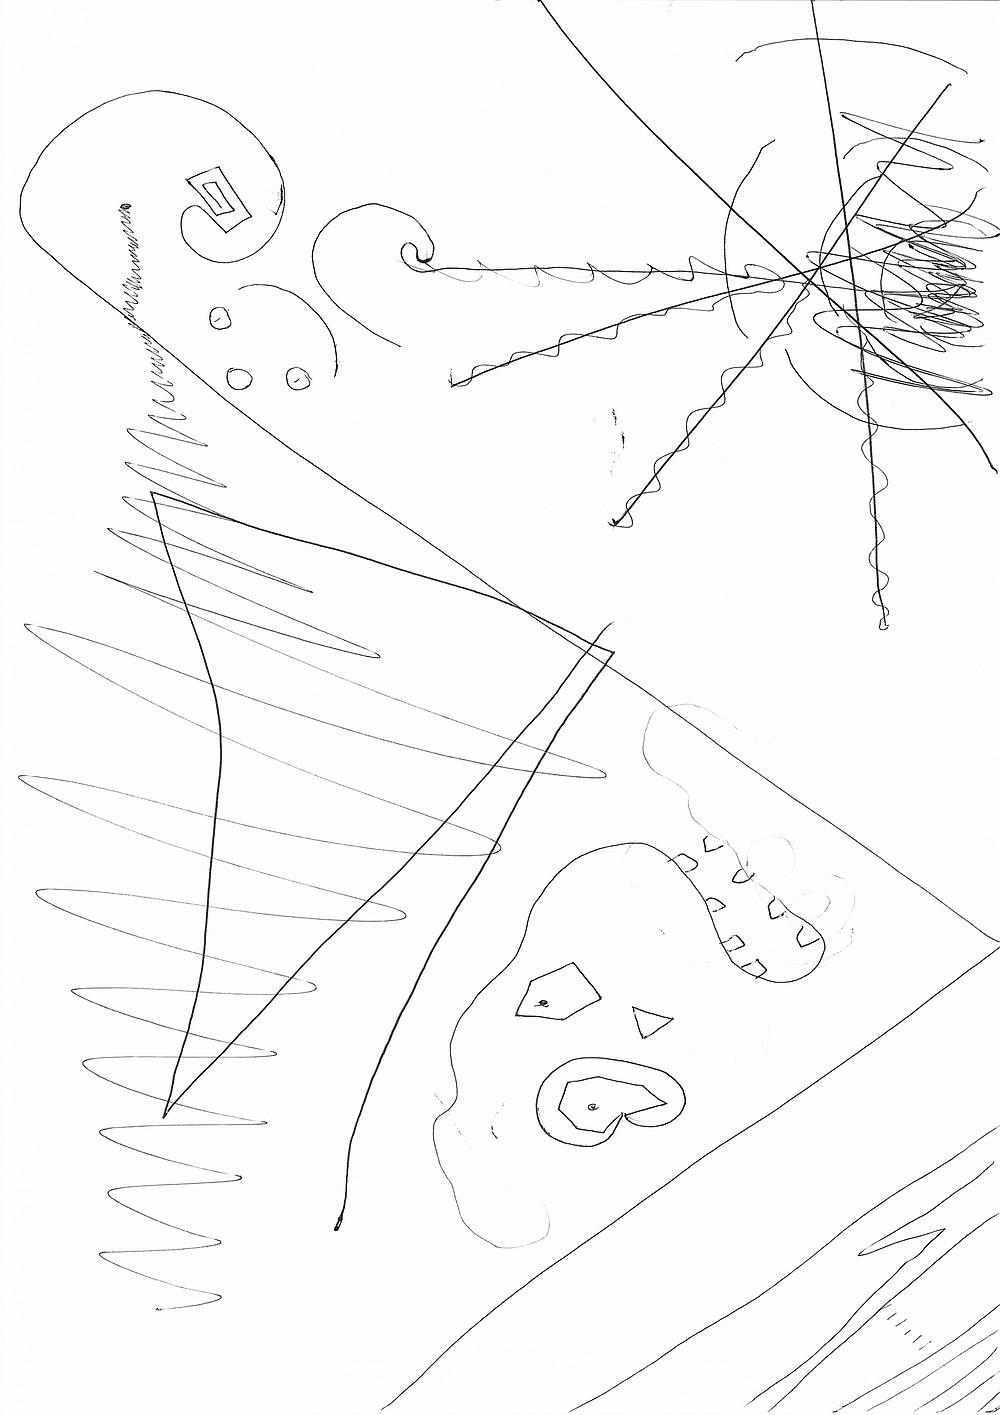 I sing - you paint Heini Matilda Ernamo_Page_1.jpg